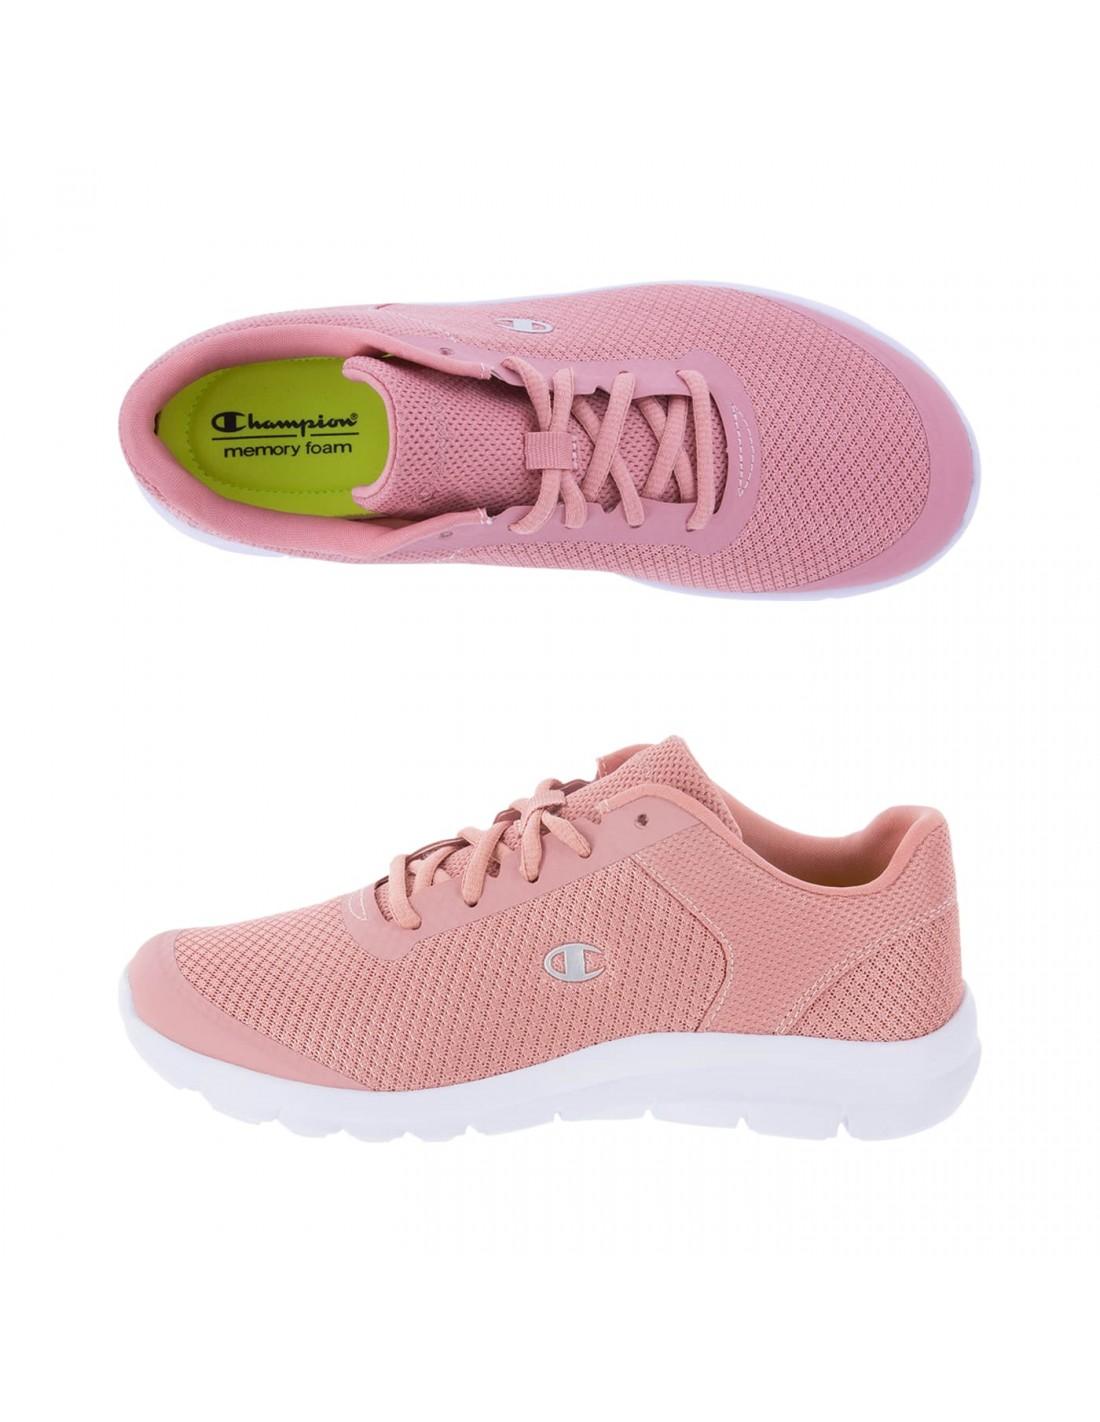 ca0bba78bb2aa Womens champion gusto ii payless jpg 1100x1422 Orange champion payless shoe